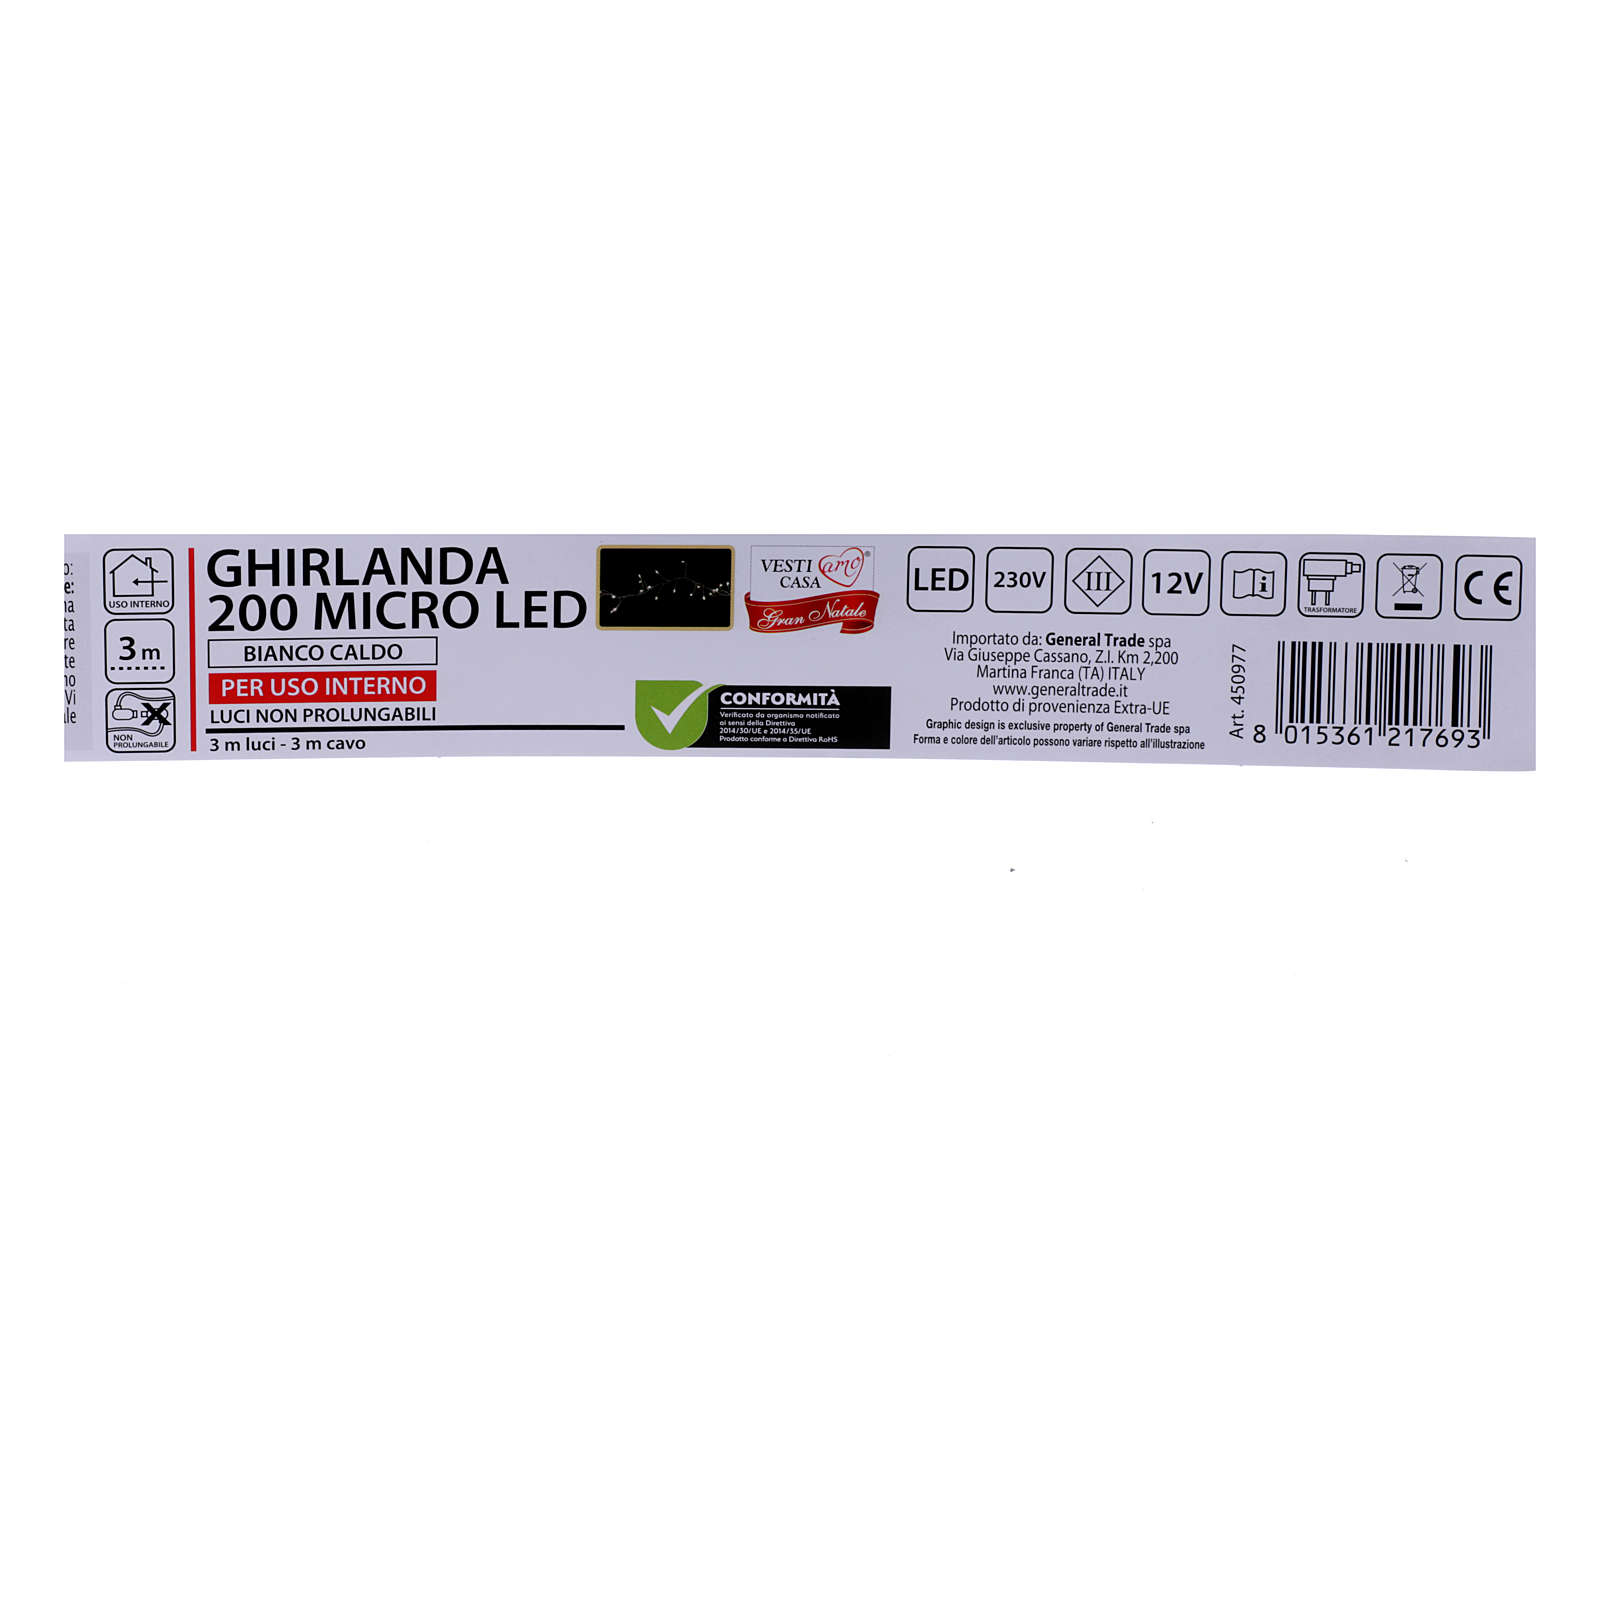 Ghirlanda Natalizia 200 micro LED bianco caldo INTERNO corrente 3